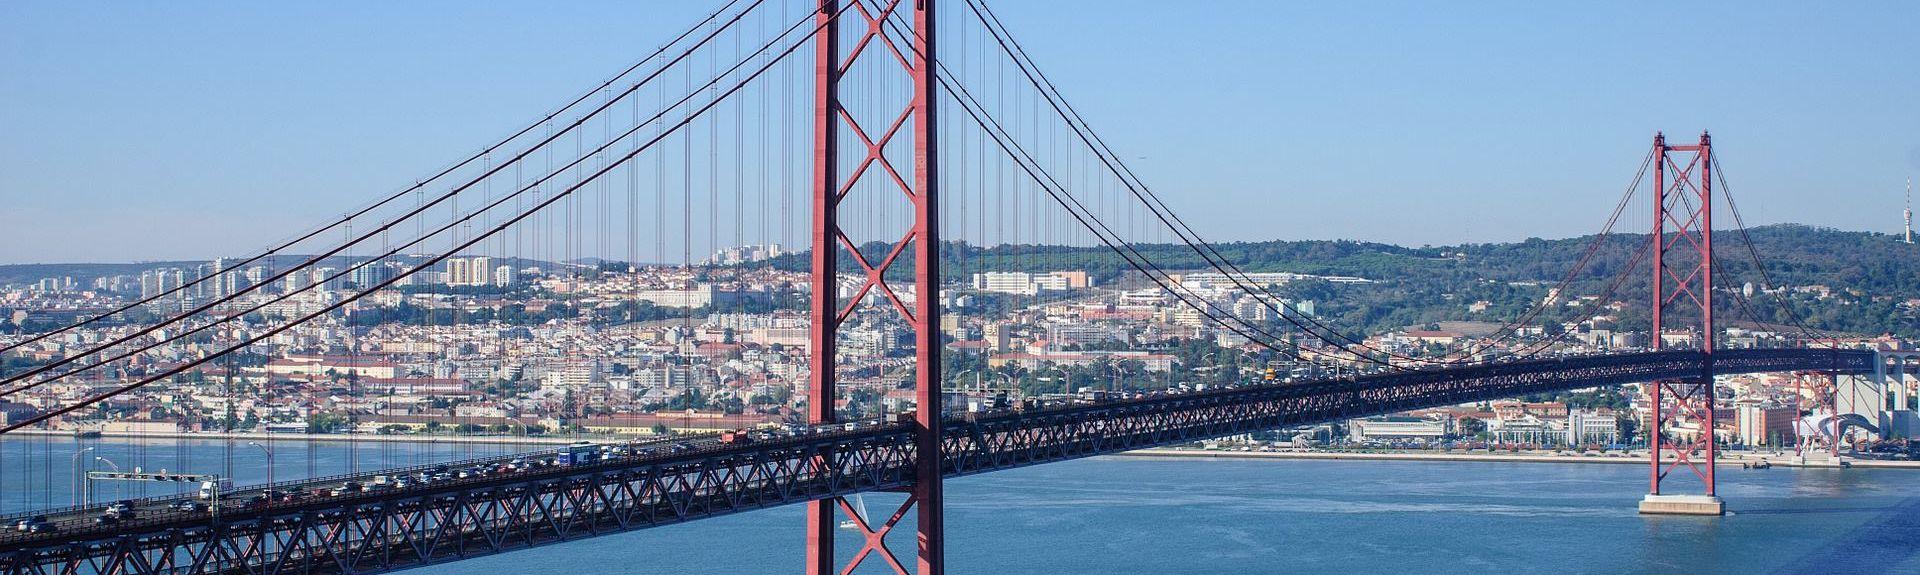 São Vicente, Lisbon, Portugal